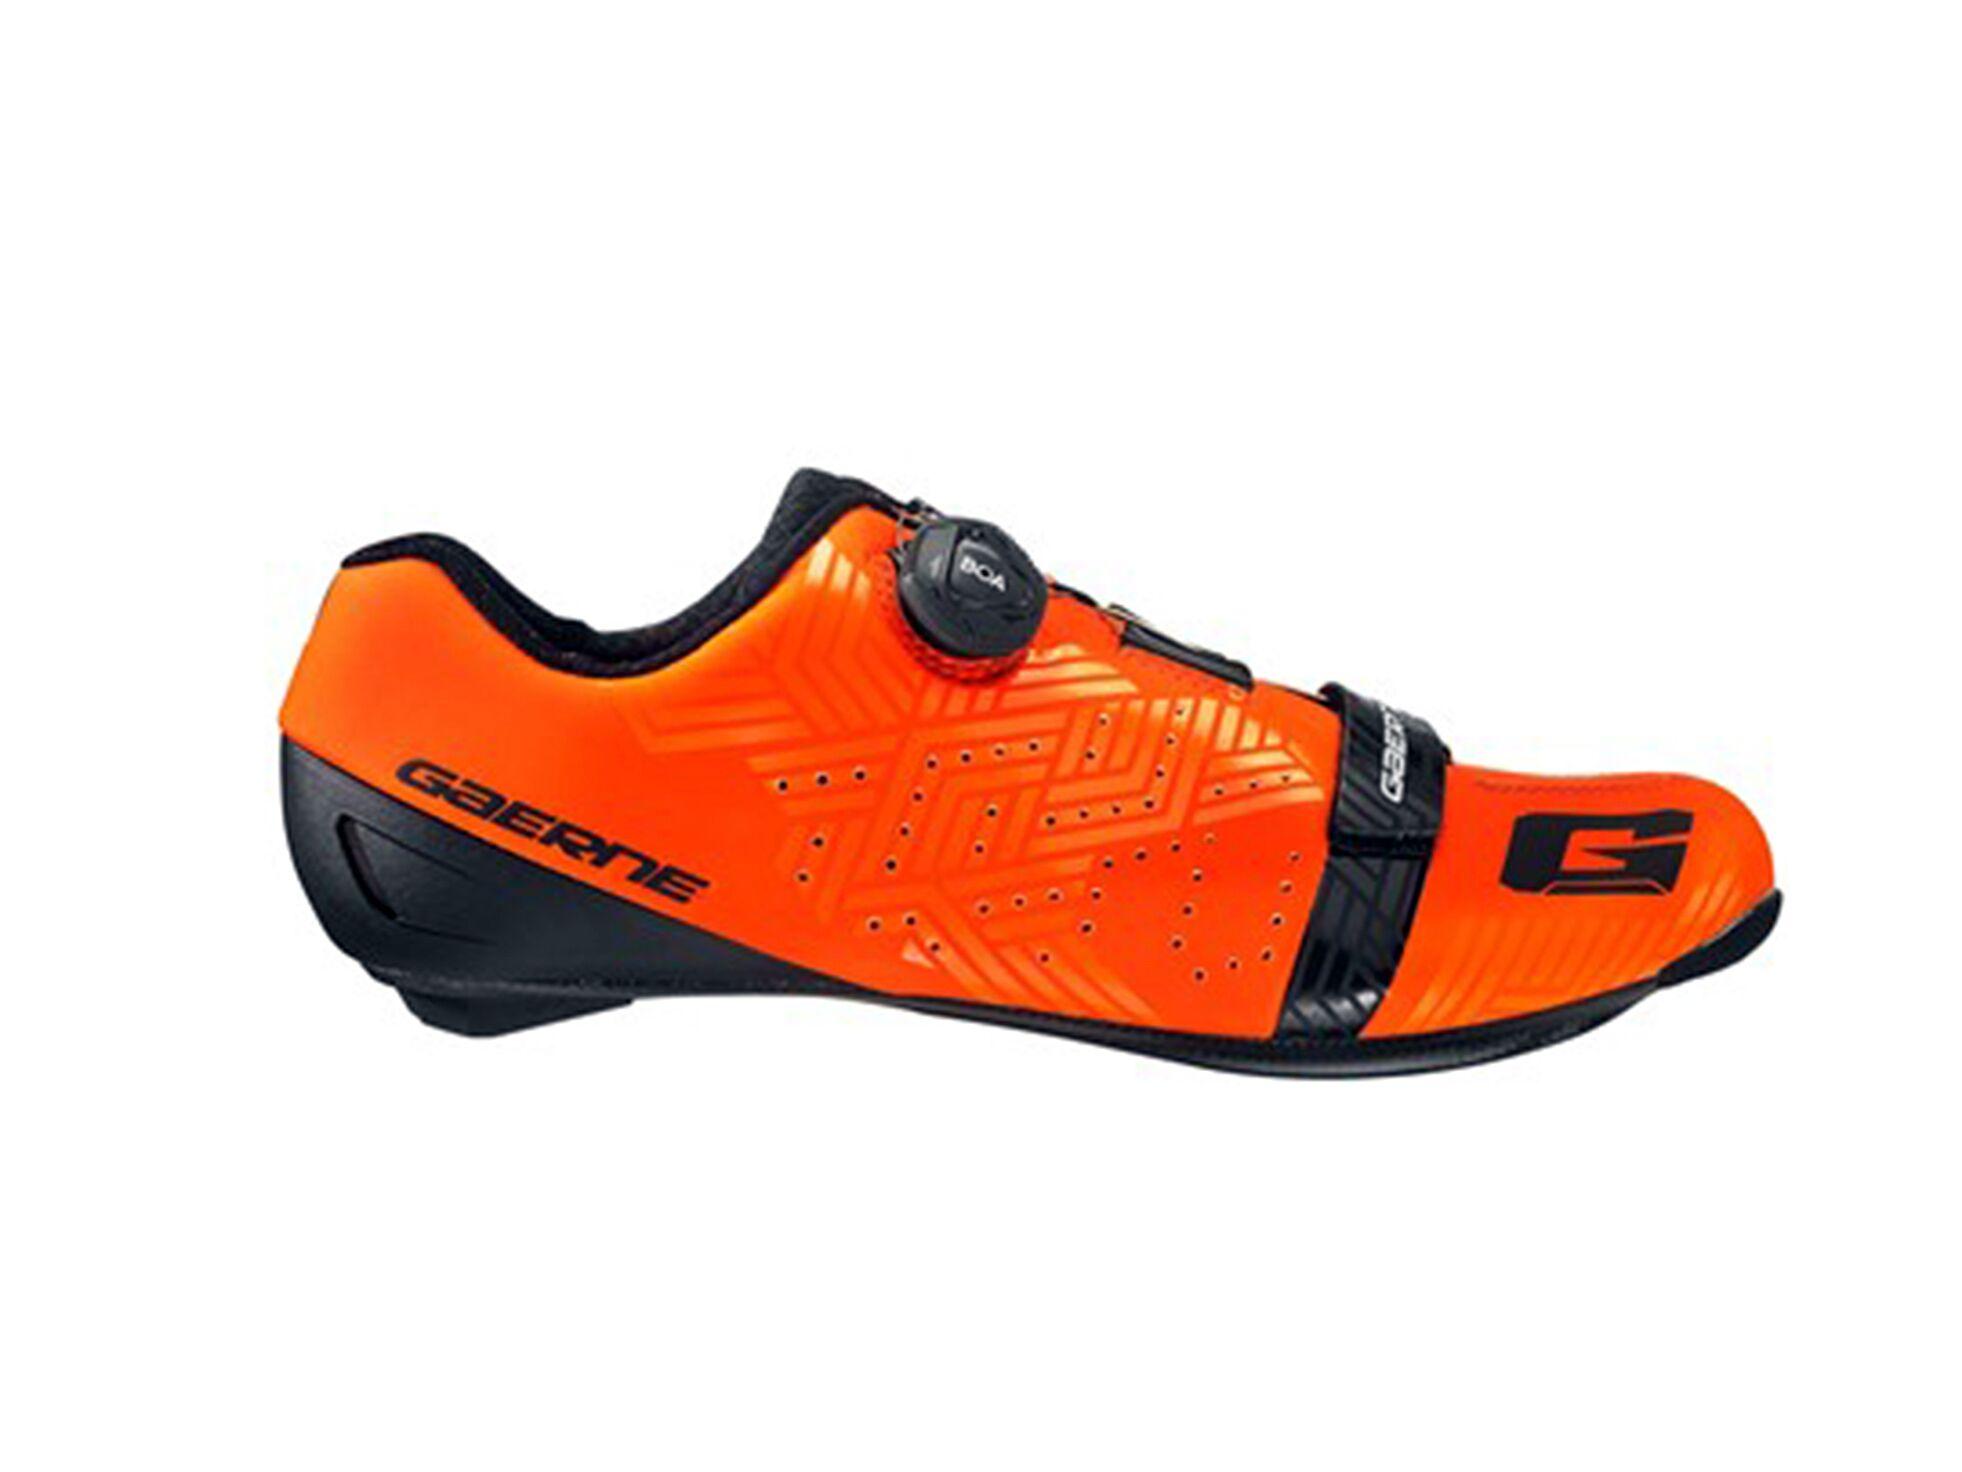 Gaerne Volata Carbon 2020 karbon országúti kerékpáros cipő